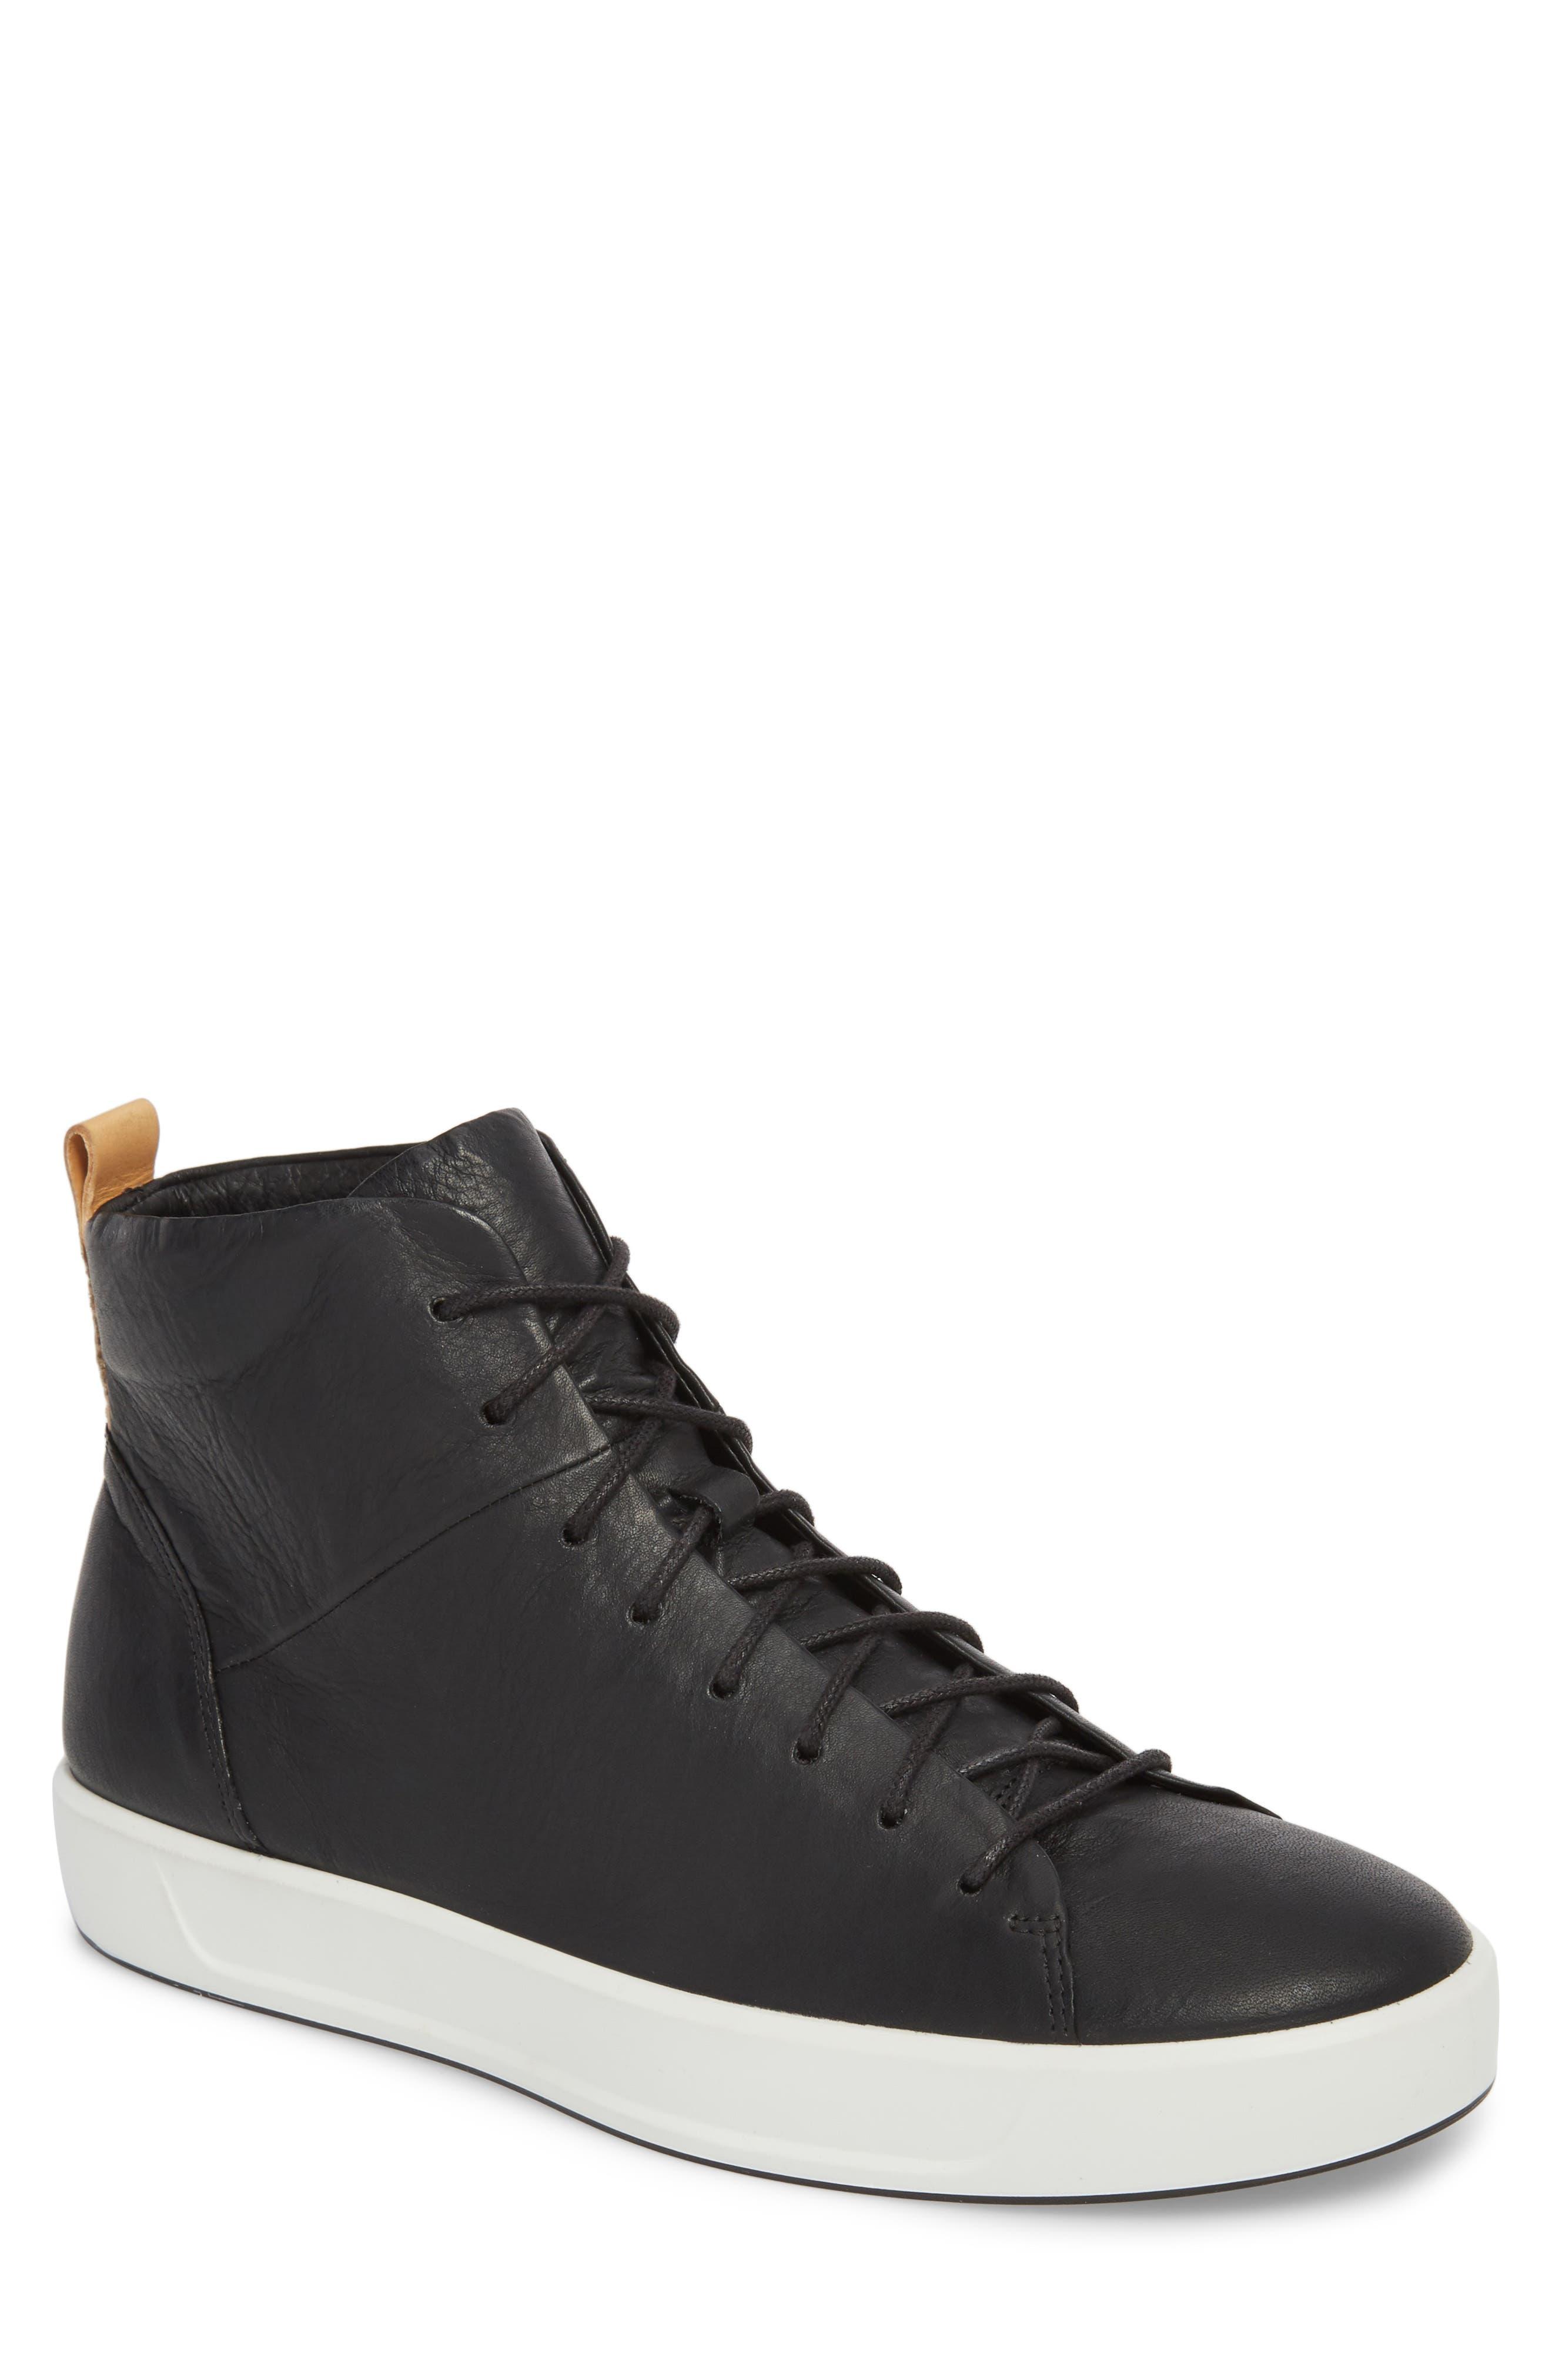 Soft 8 Sneaker,                             Main thumbnail 1, color,                             Black/Black Leather